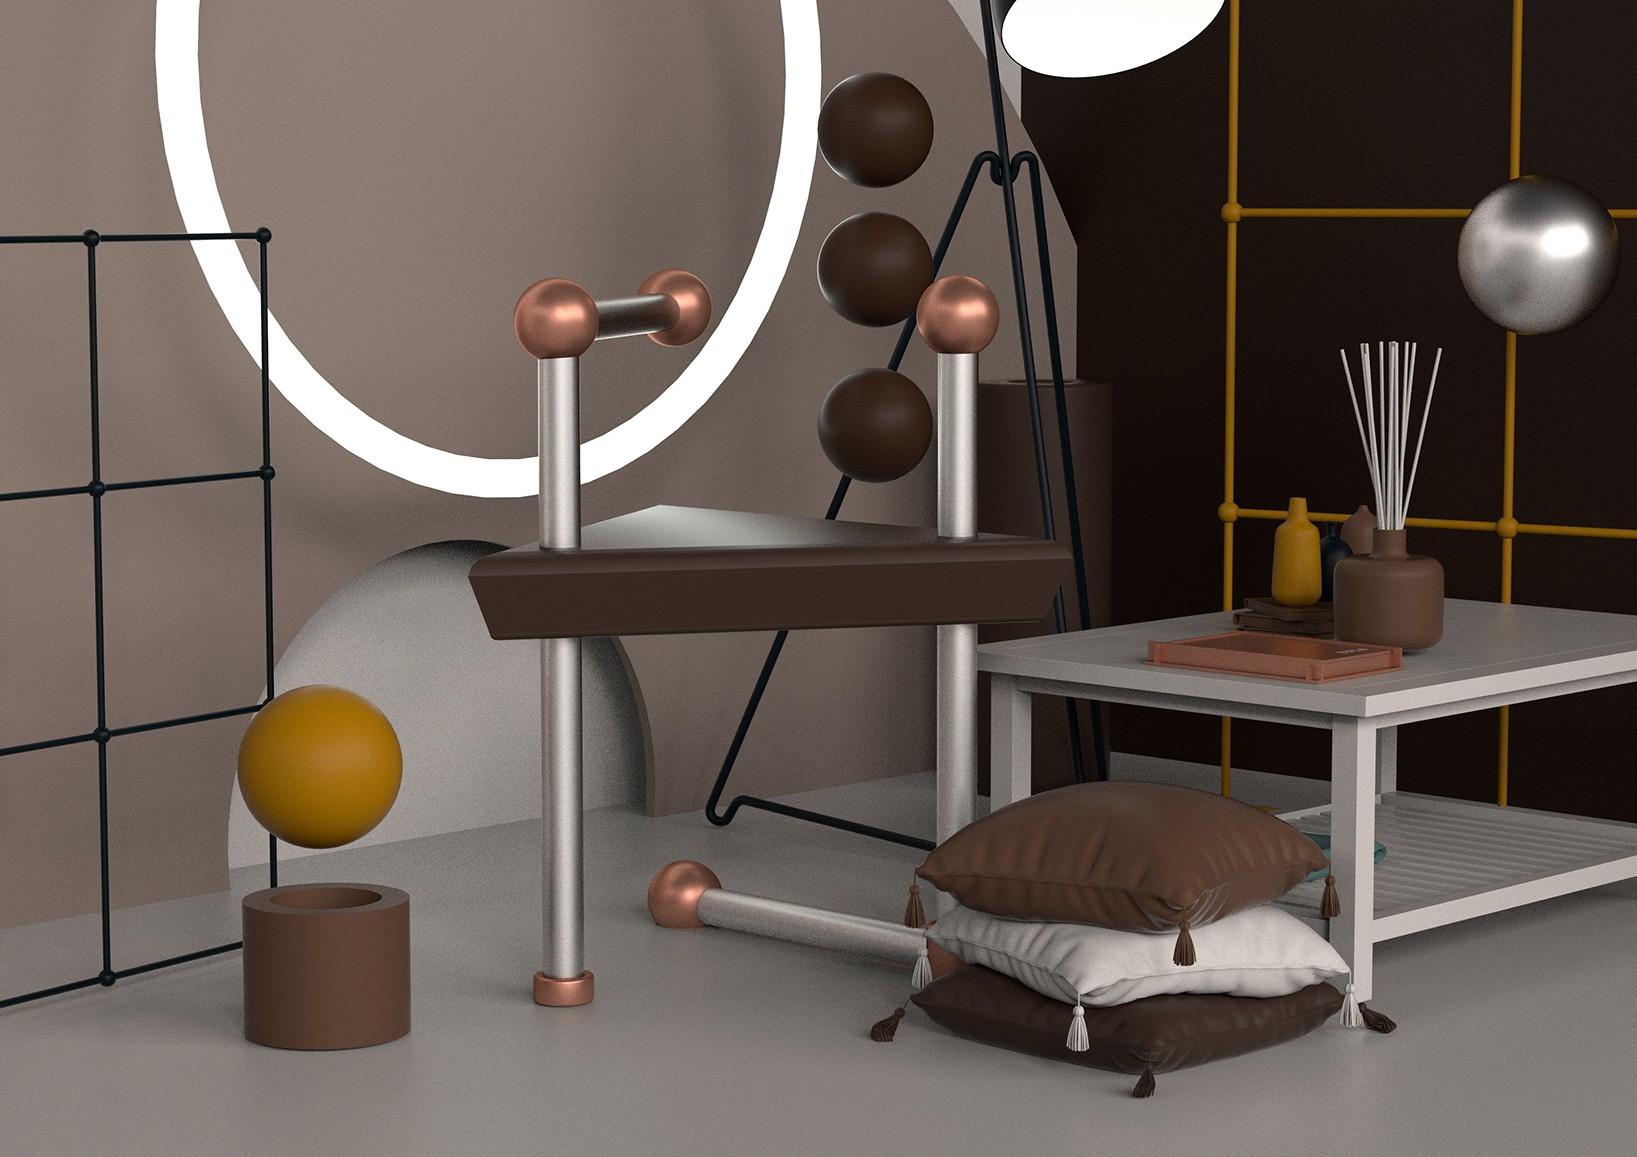 Murad-design-studio-designagentur-murad-ghanaimy-design-werbung-kreativ-stuhl-produktdesign